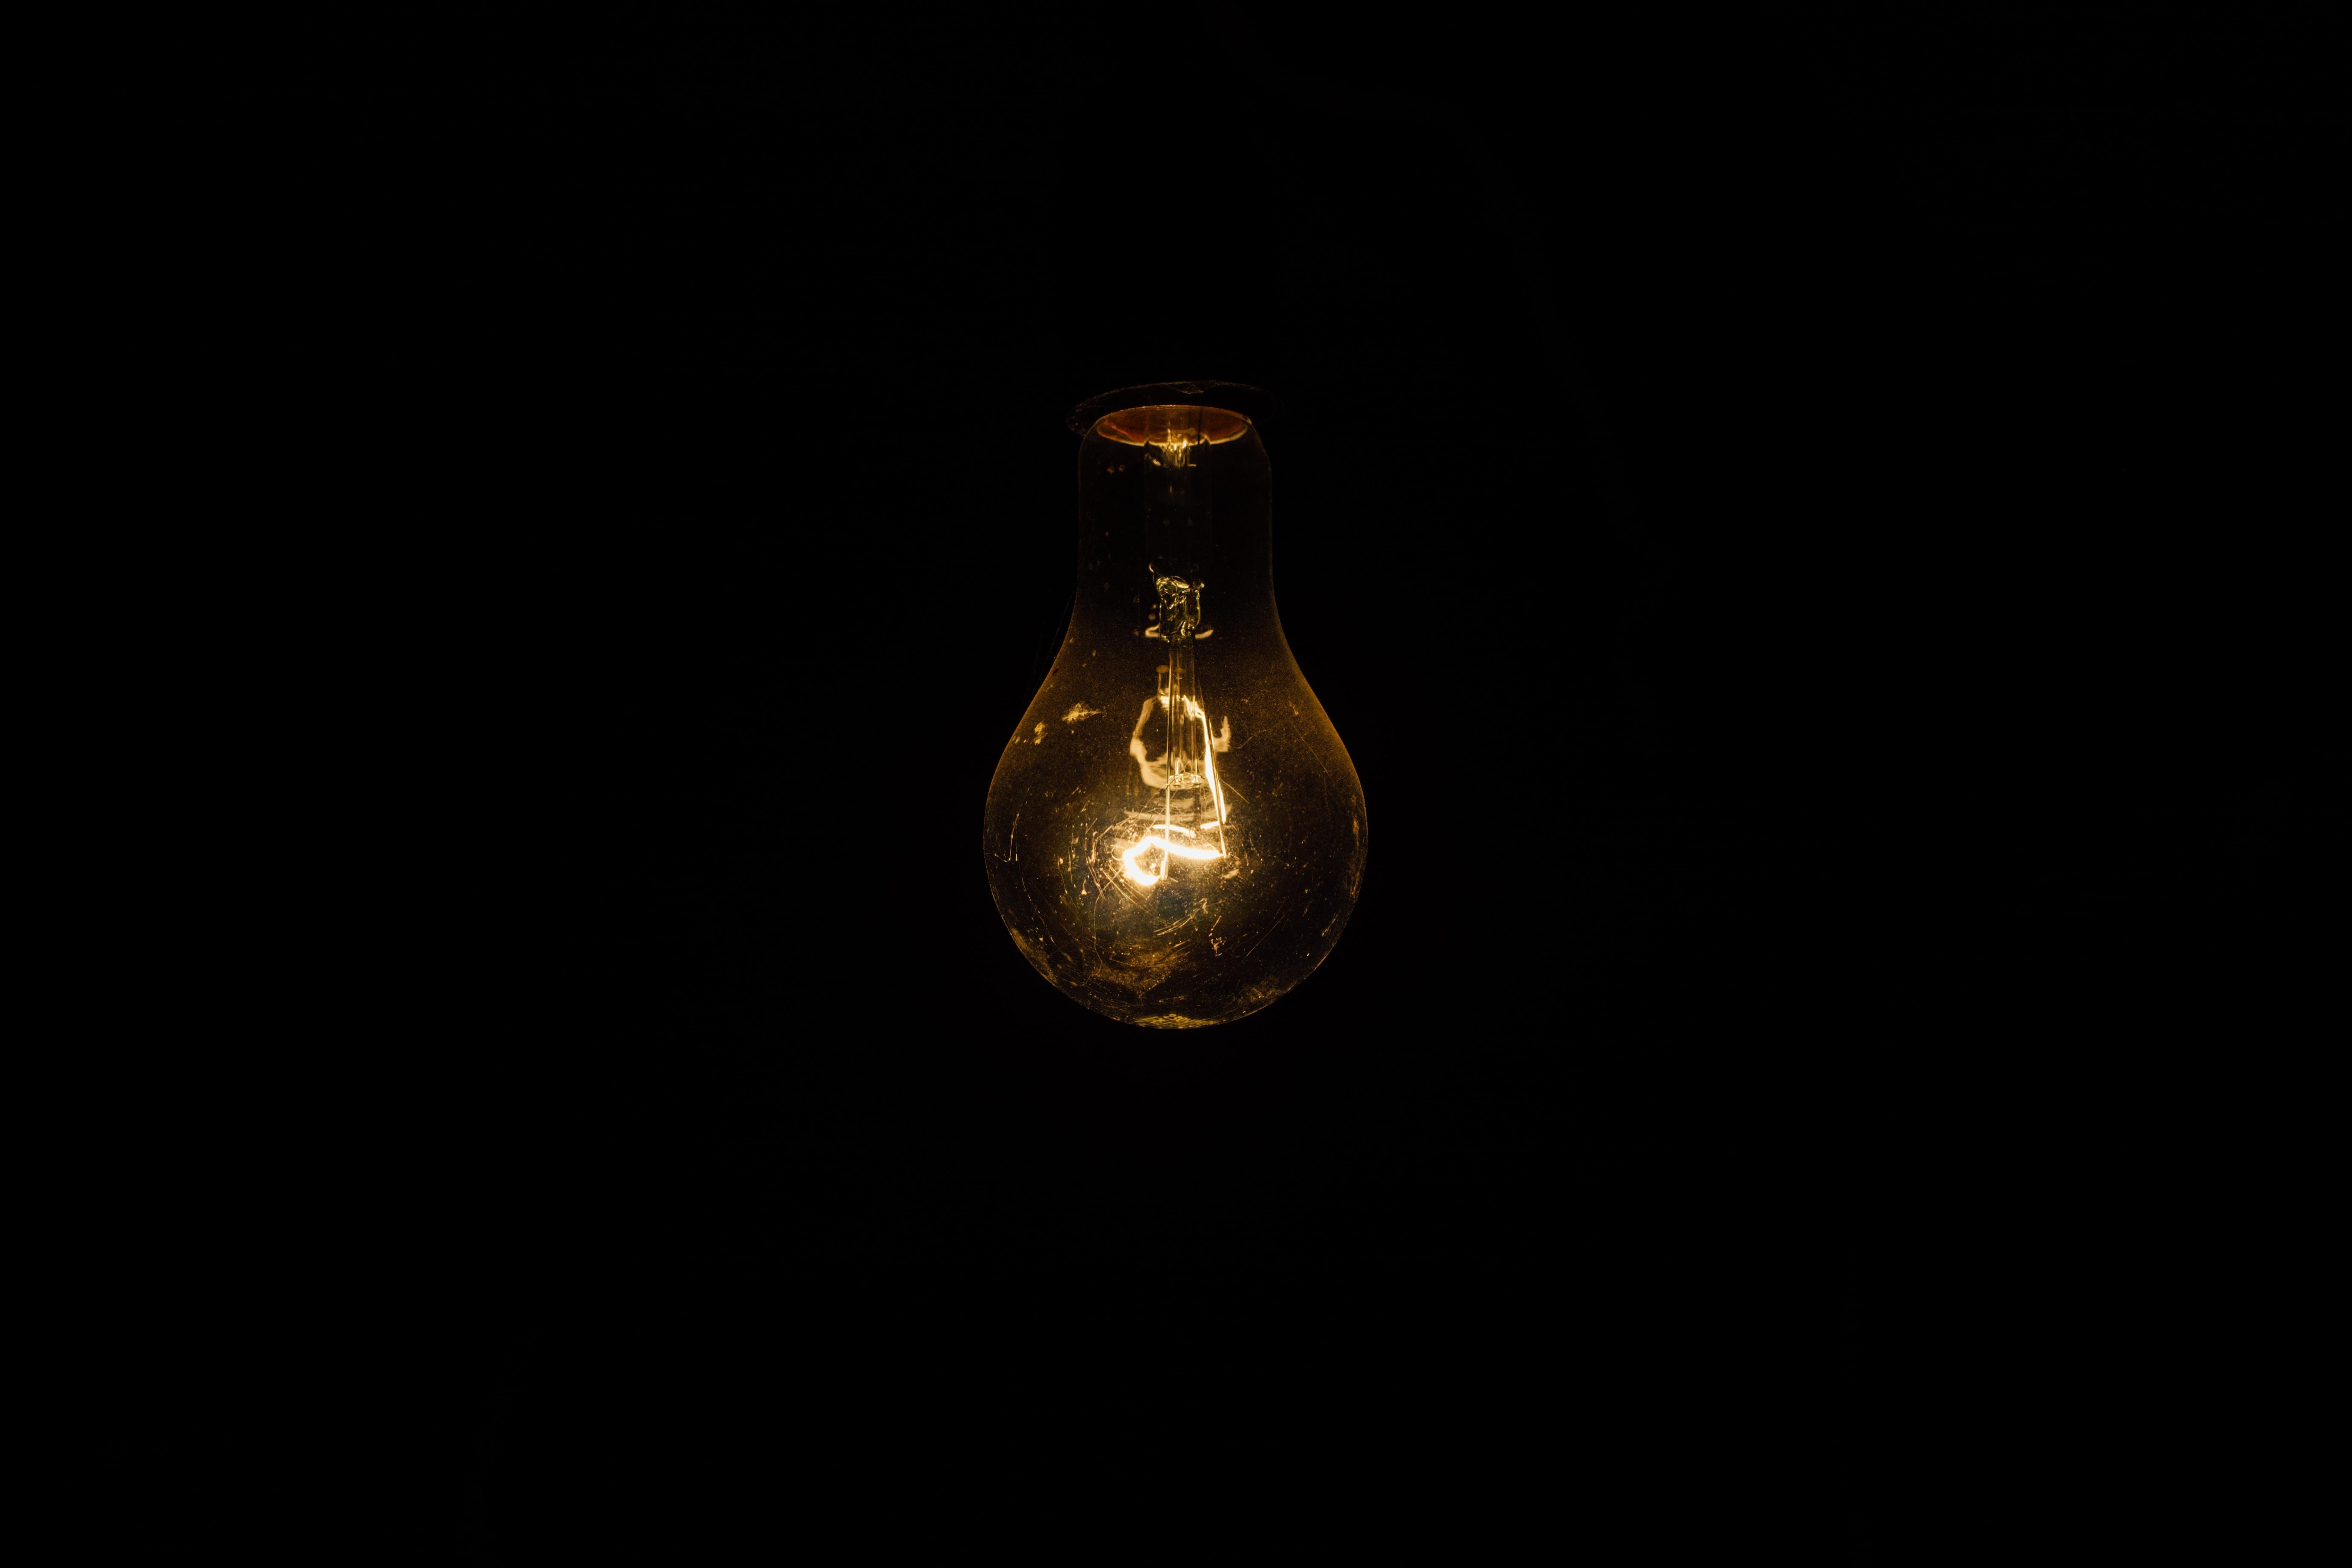 closeup photo of lighted bulb